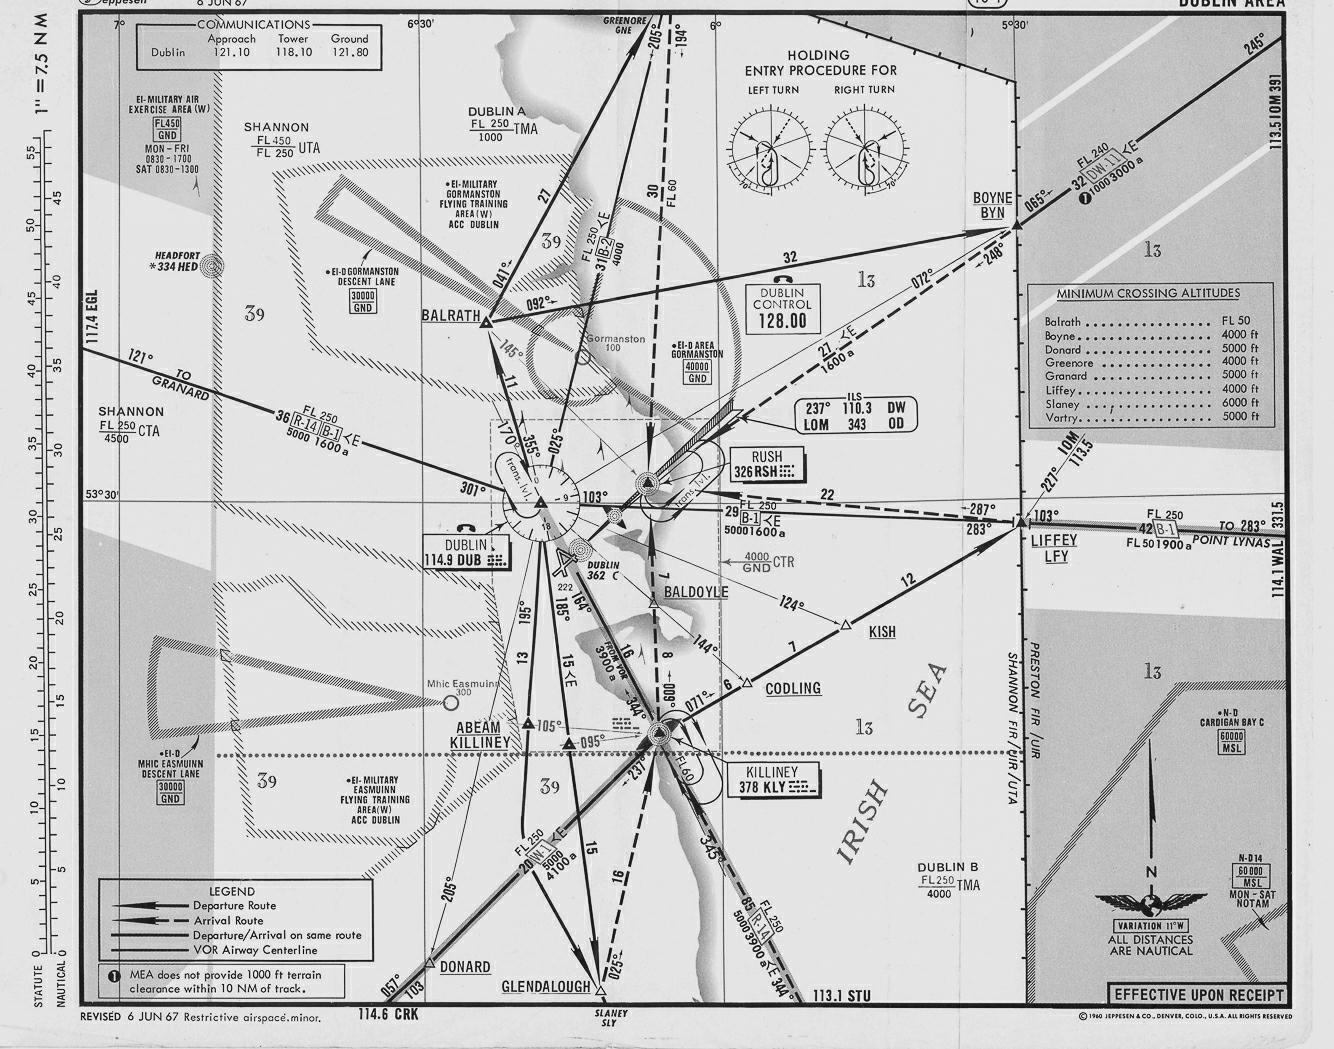 dub-area-chart-1967